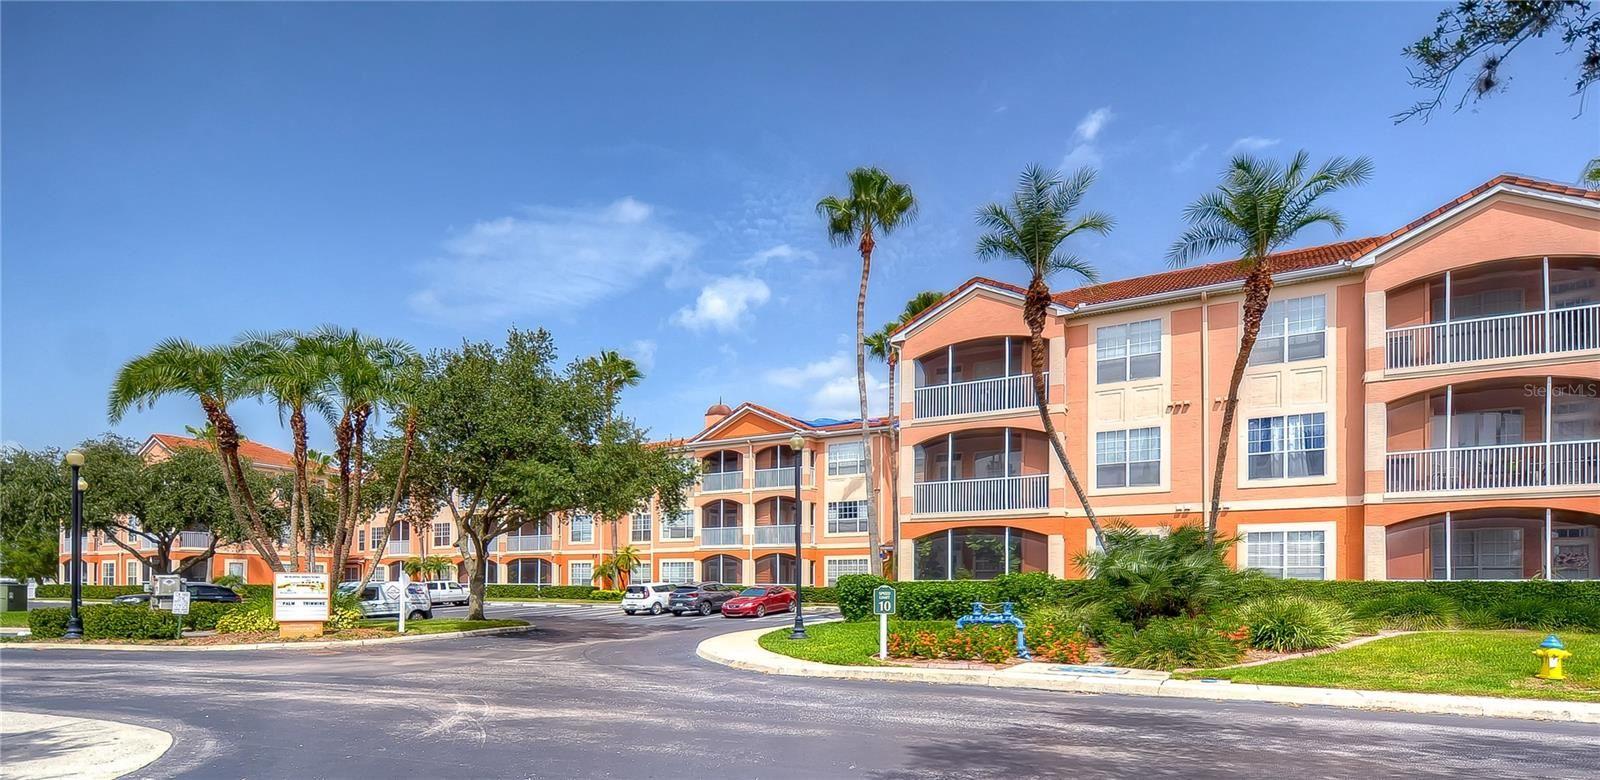 5000 CULBREATH KEY WAY #1105, Tampa, FL 33611 - #: T3327690